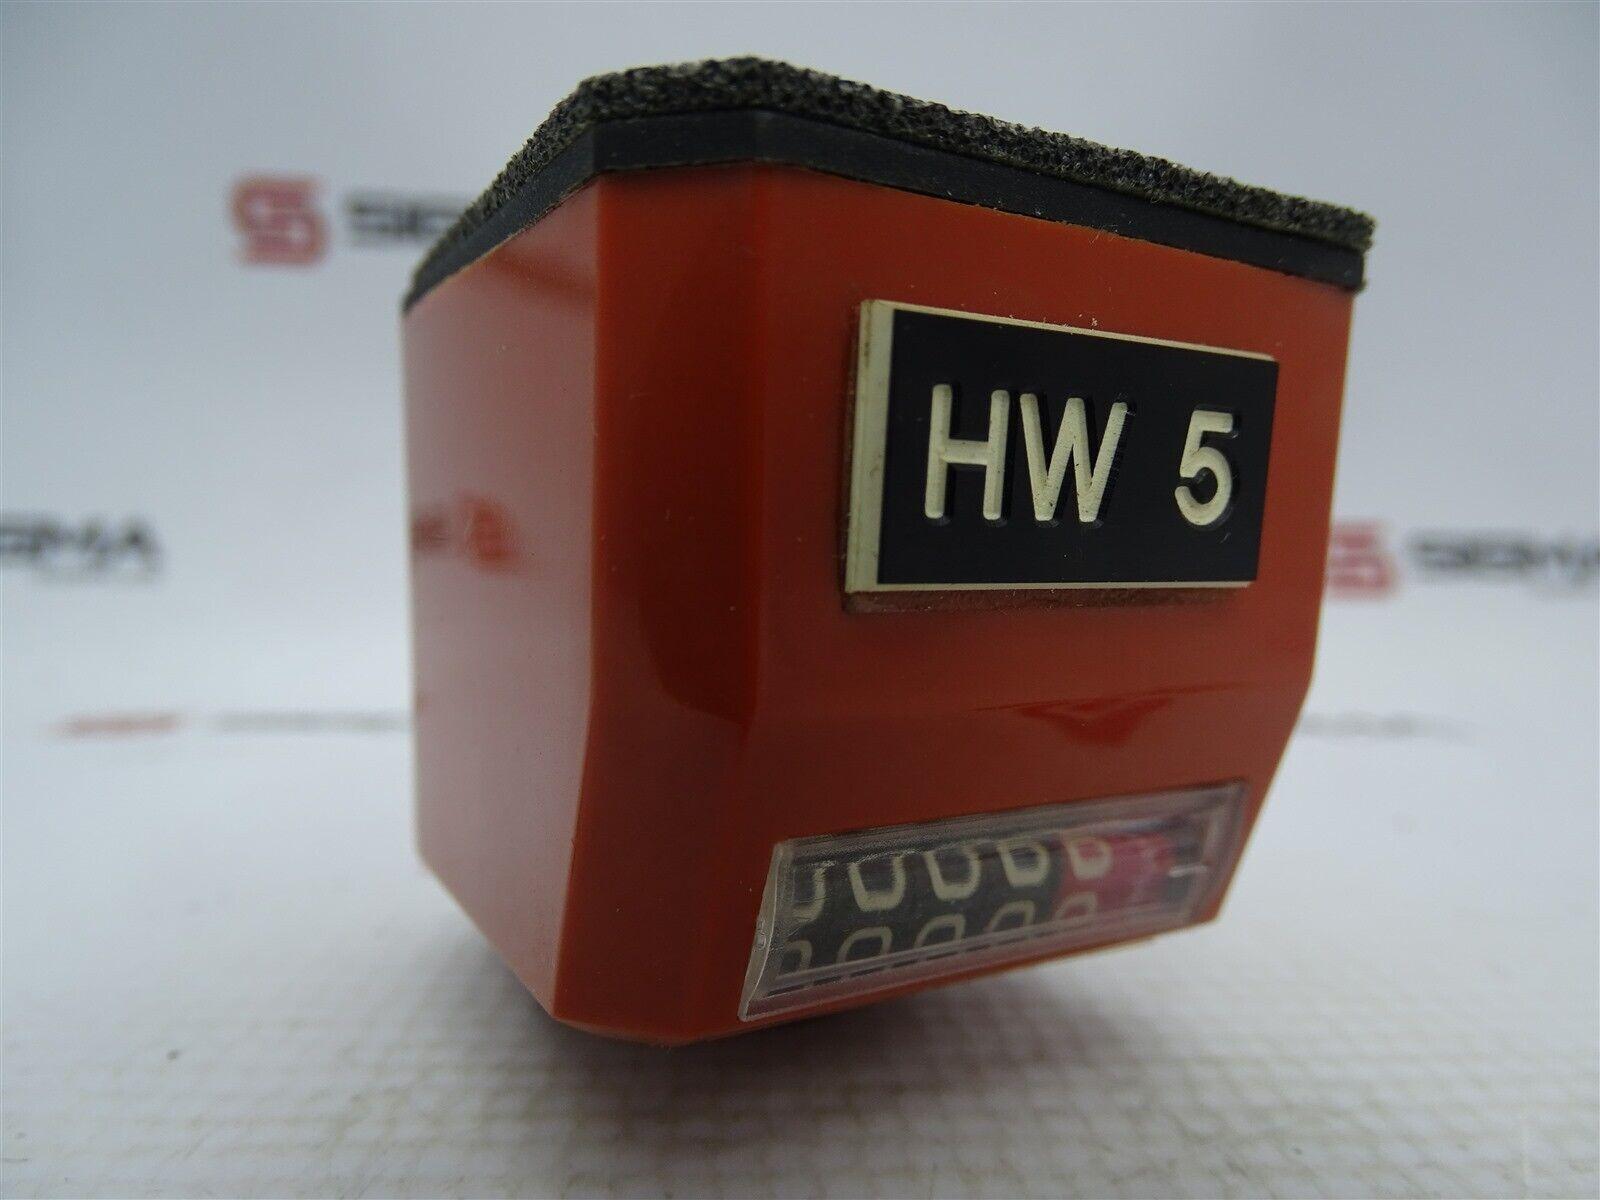 Elesa Clayton DD52-AN-0001.0-D-AR Mechanical Position Indicator Counter